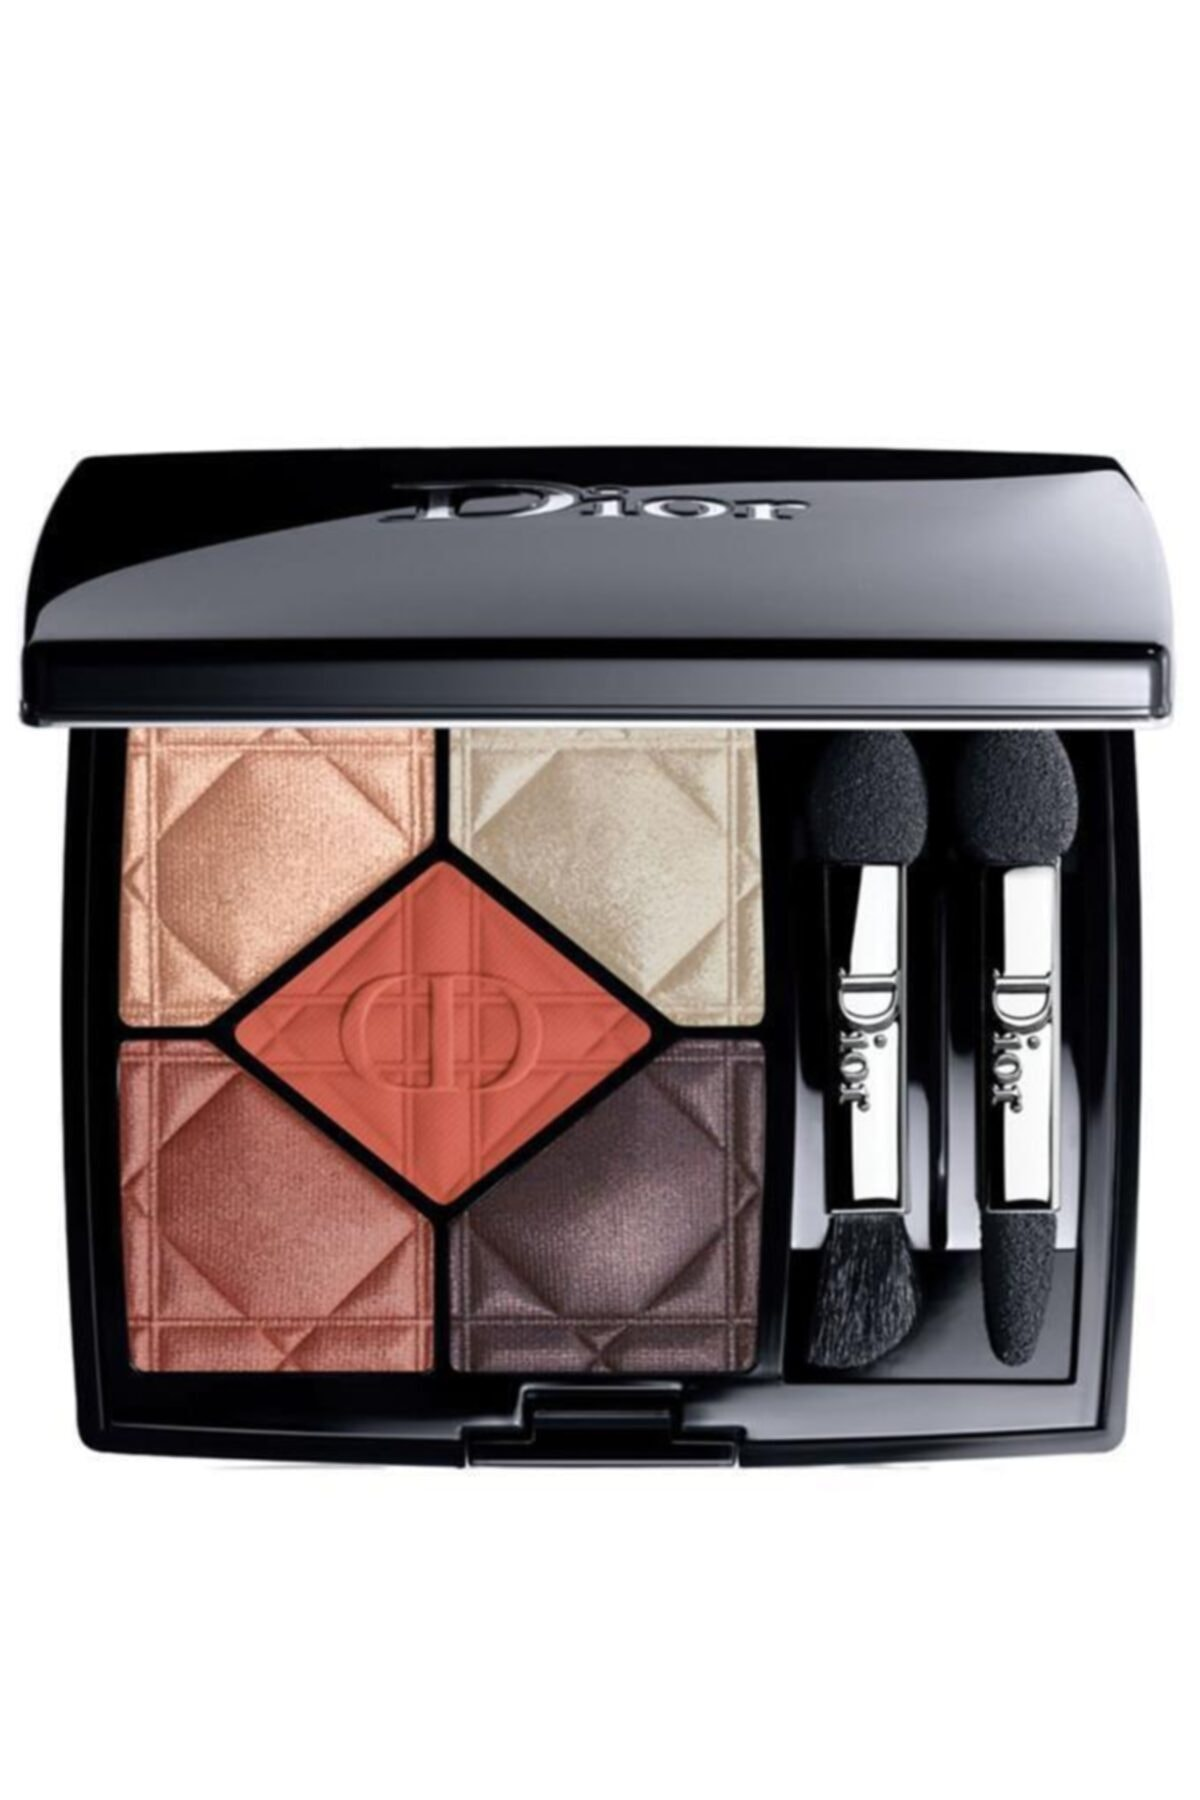 Dior 5 Couleurs Eyeshadow Palette 767 Inflame Far Paleti 1